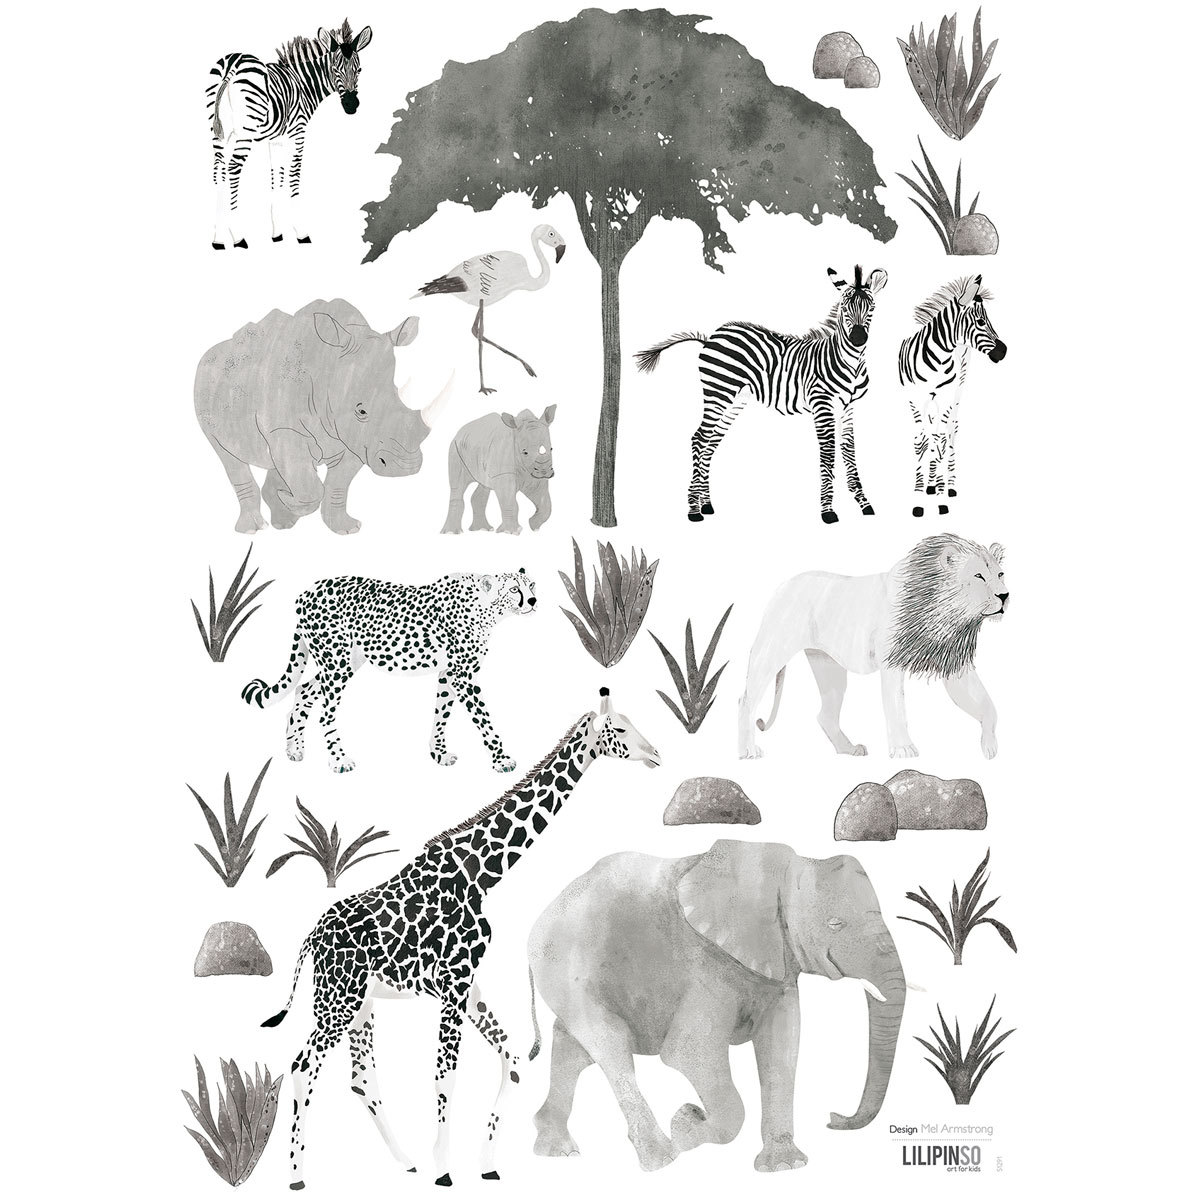 Sticker Serengeti - Stickers A3 - Planche Composée d'Animaux Serengeti - Stickers A3 - Planche Composée d'Animaux